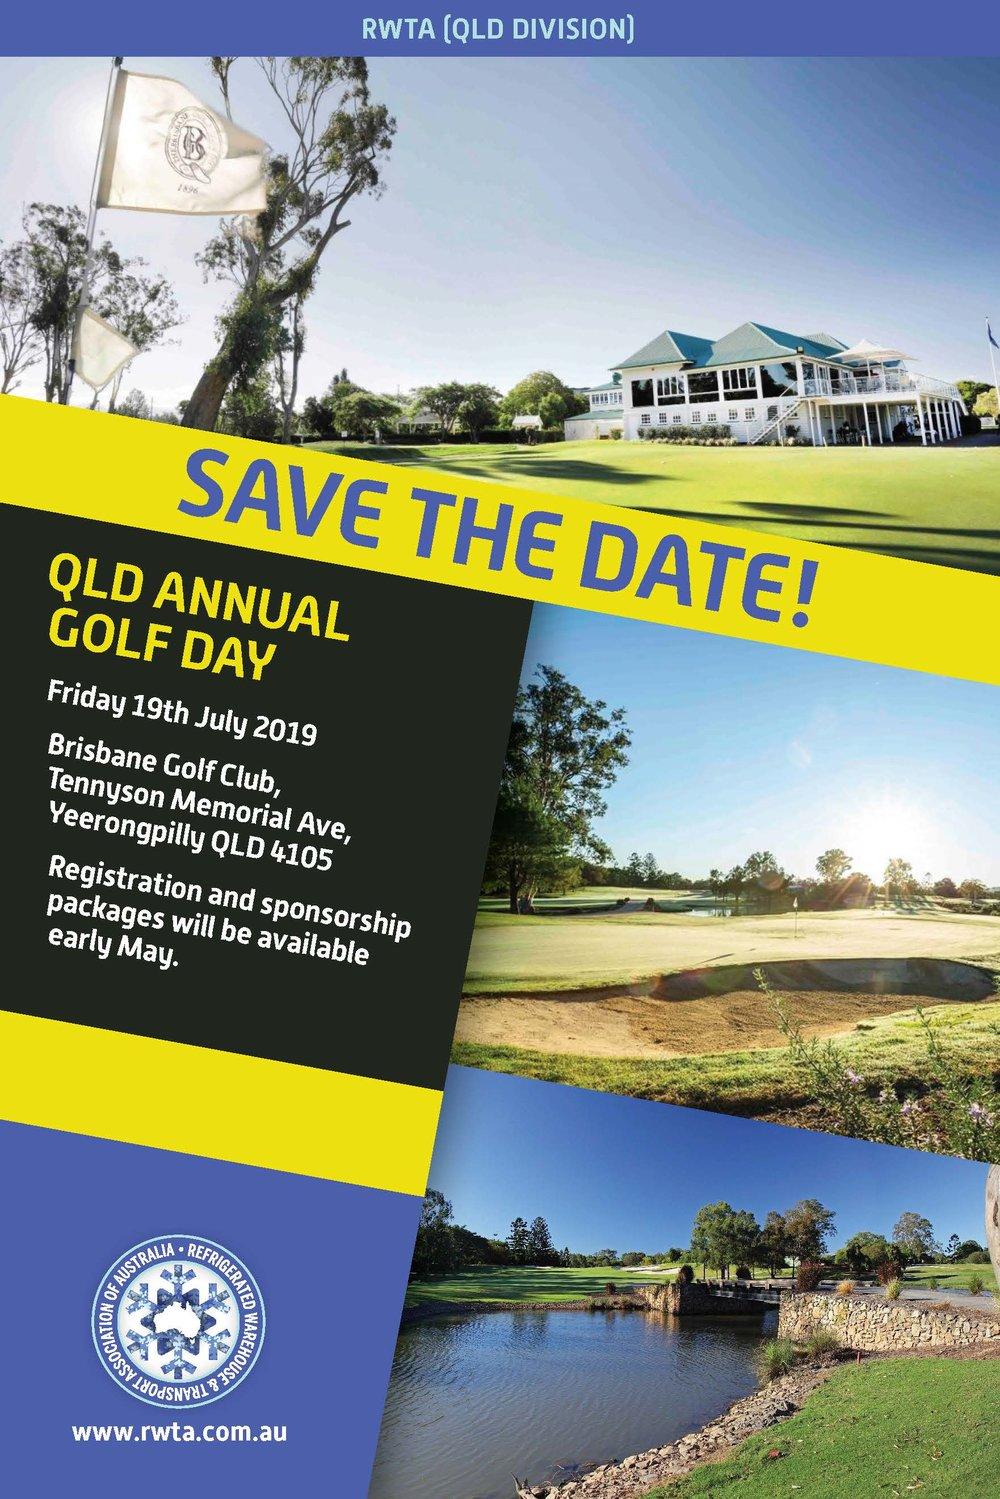 12449_RWTA_QLD Golf Day_STD_V1.jpg